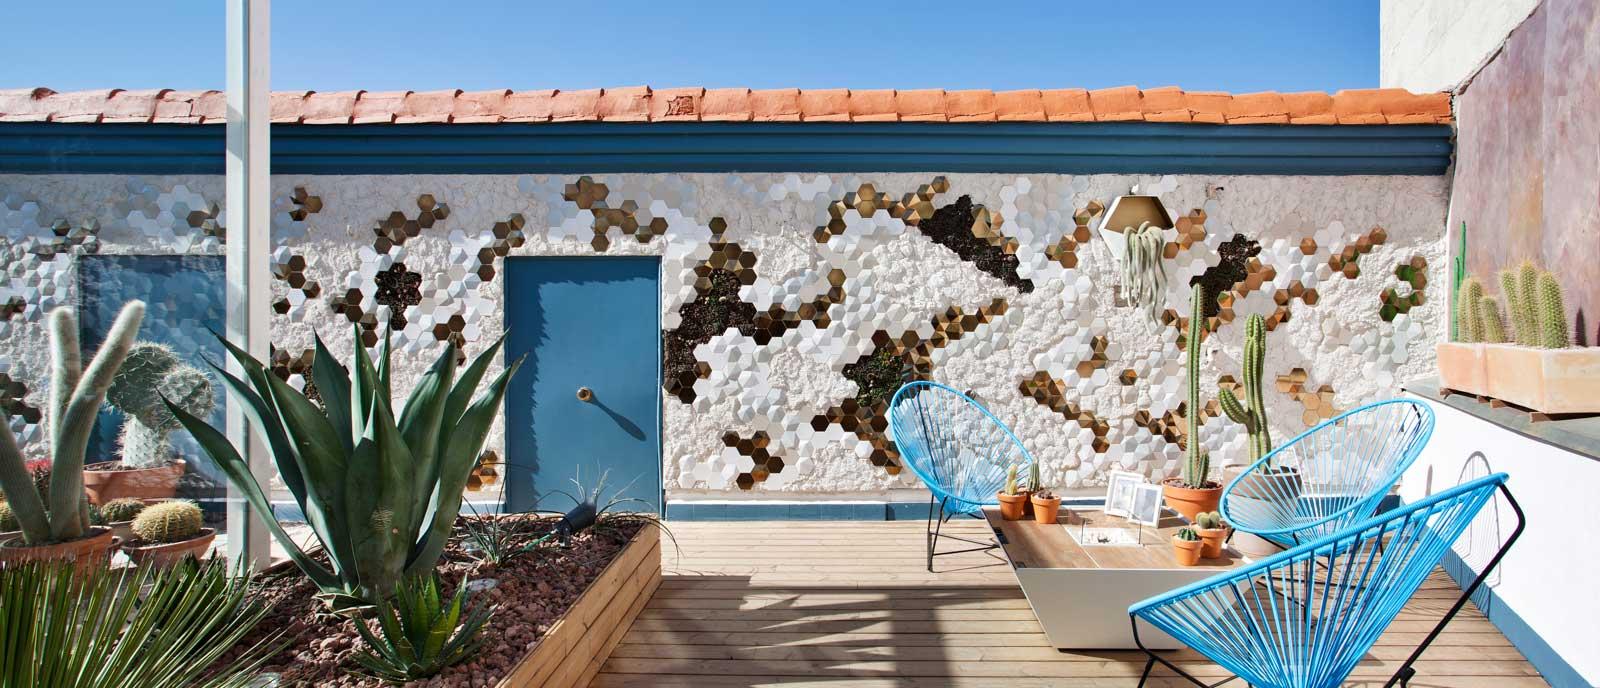 Azotea «Un vergel de contrastes» – Espacio Desert City